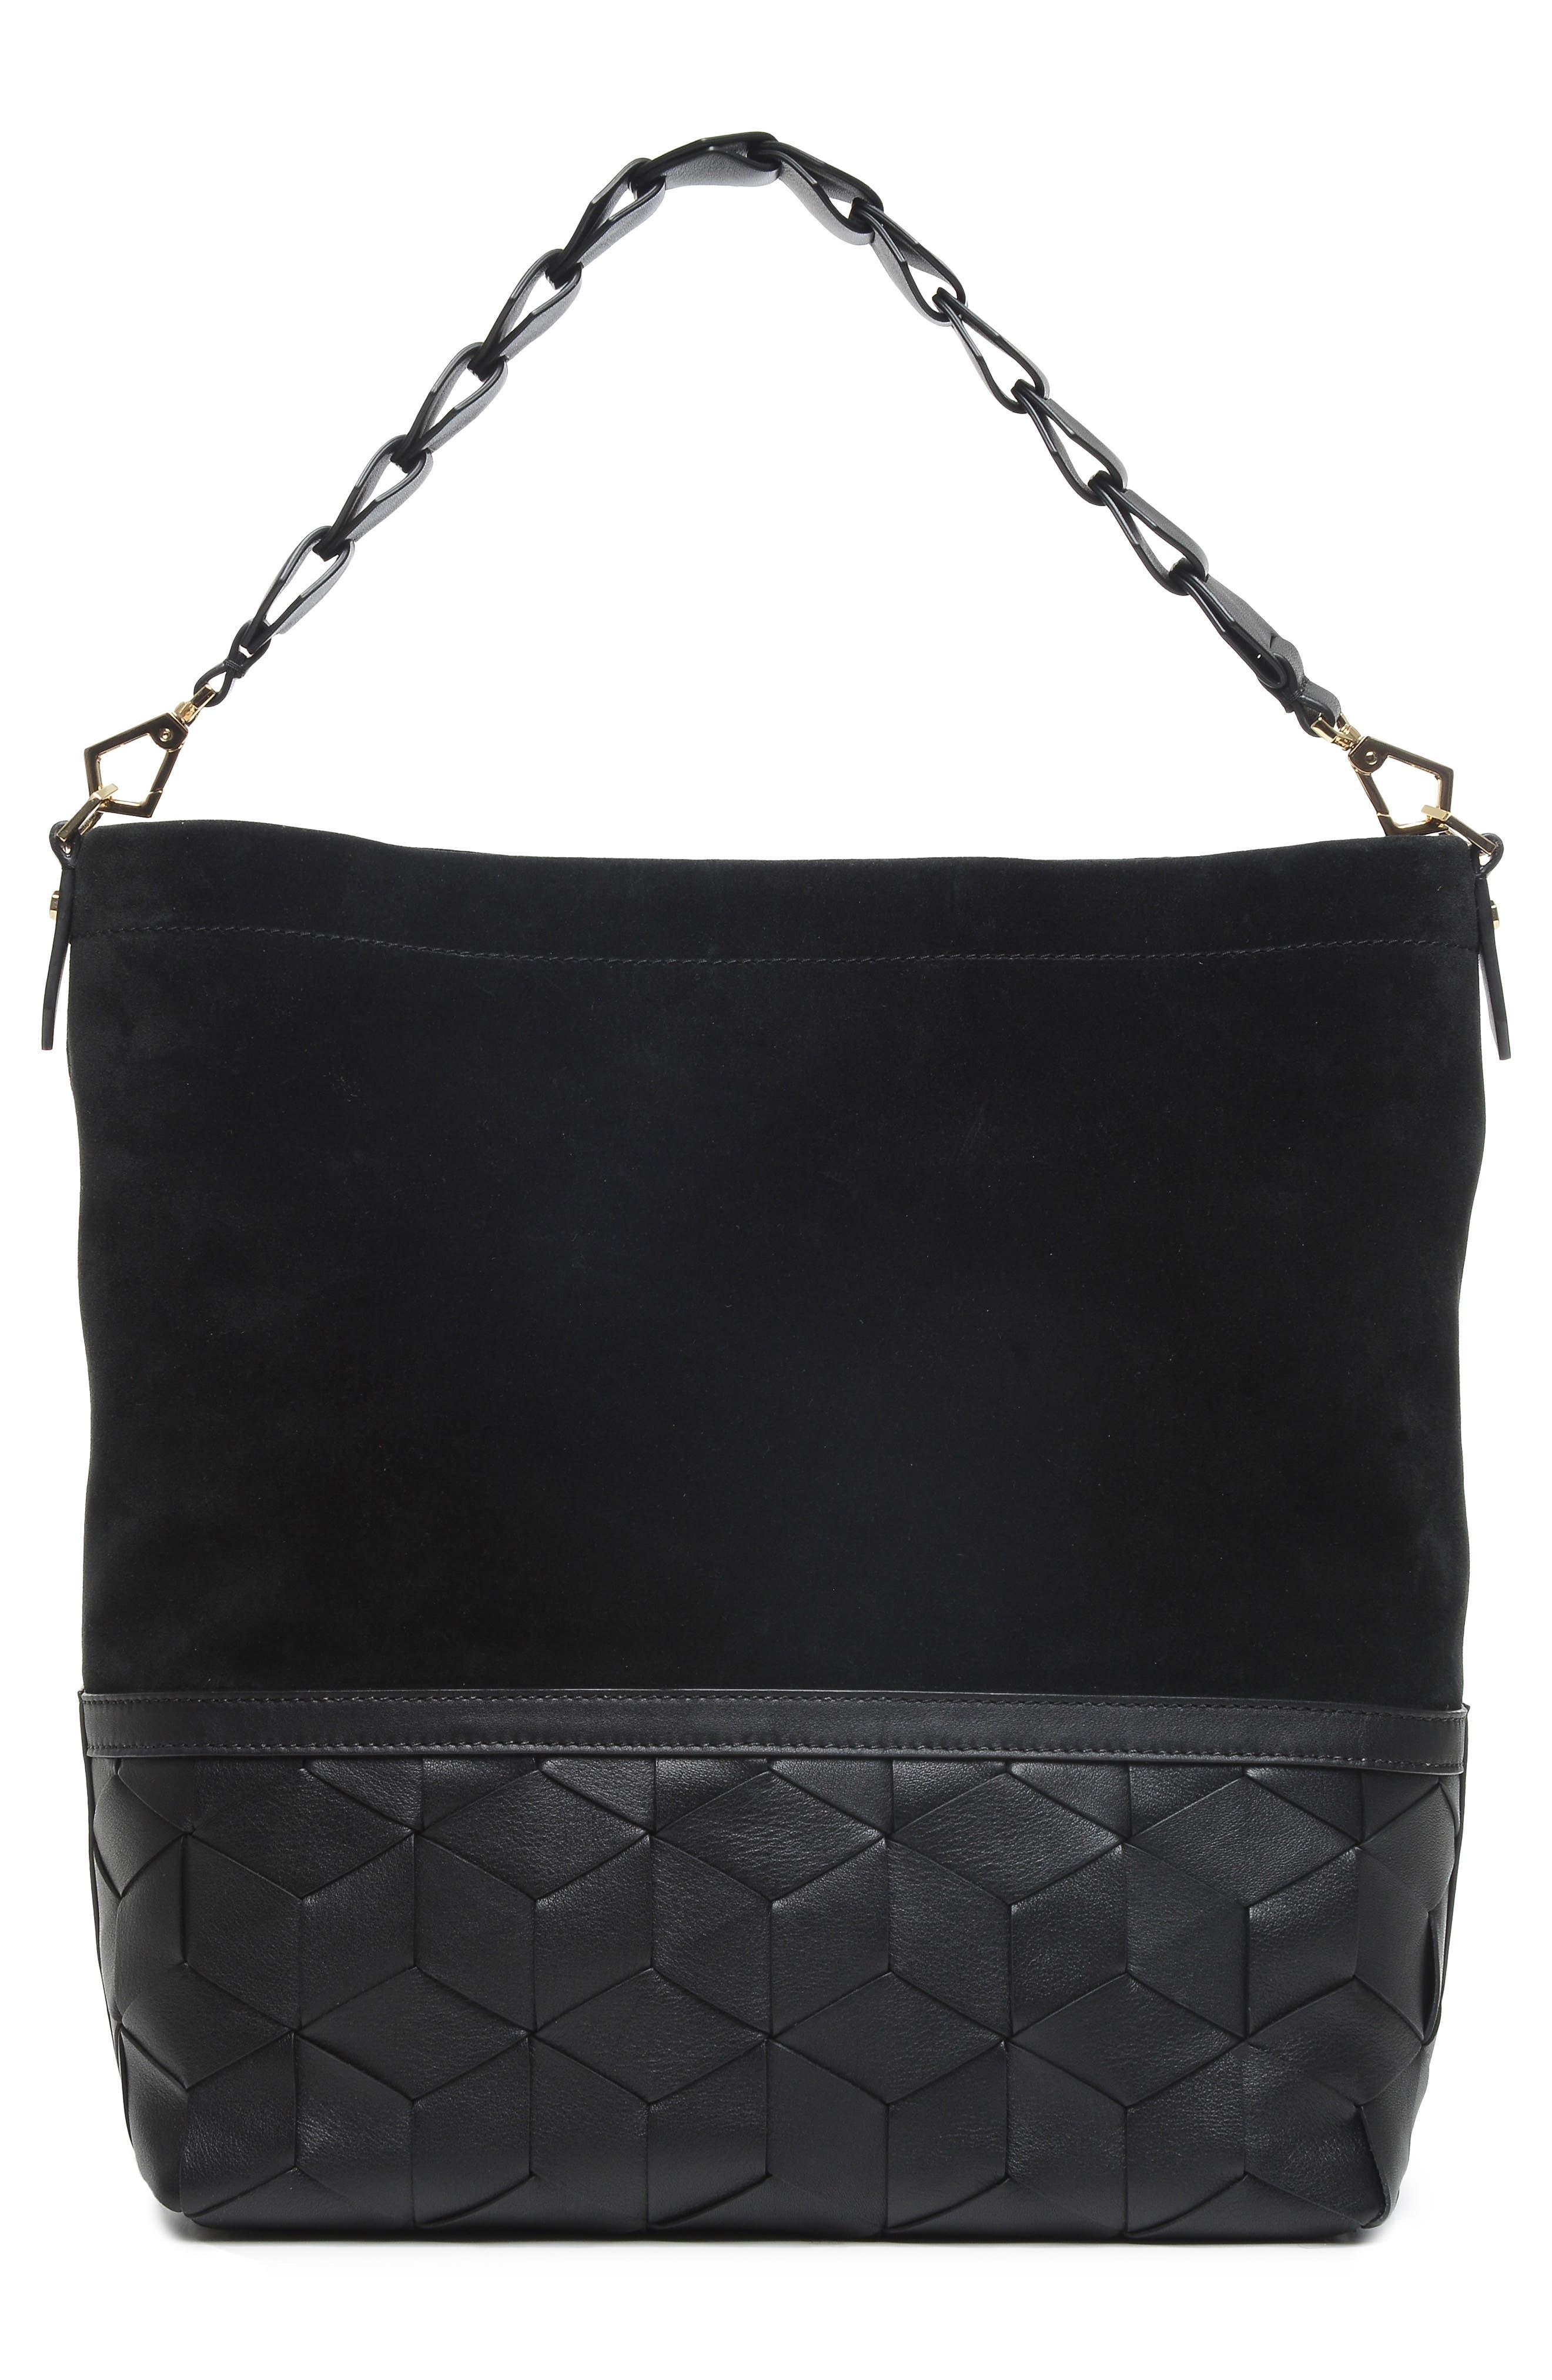 Promenade Leather & Suede Bucket Bag,                             Alternate thumbnail 3, color,                             001